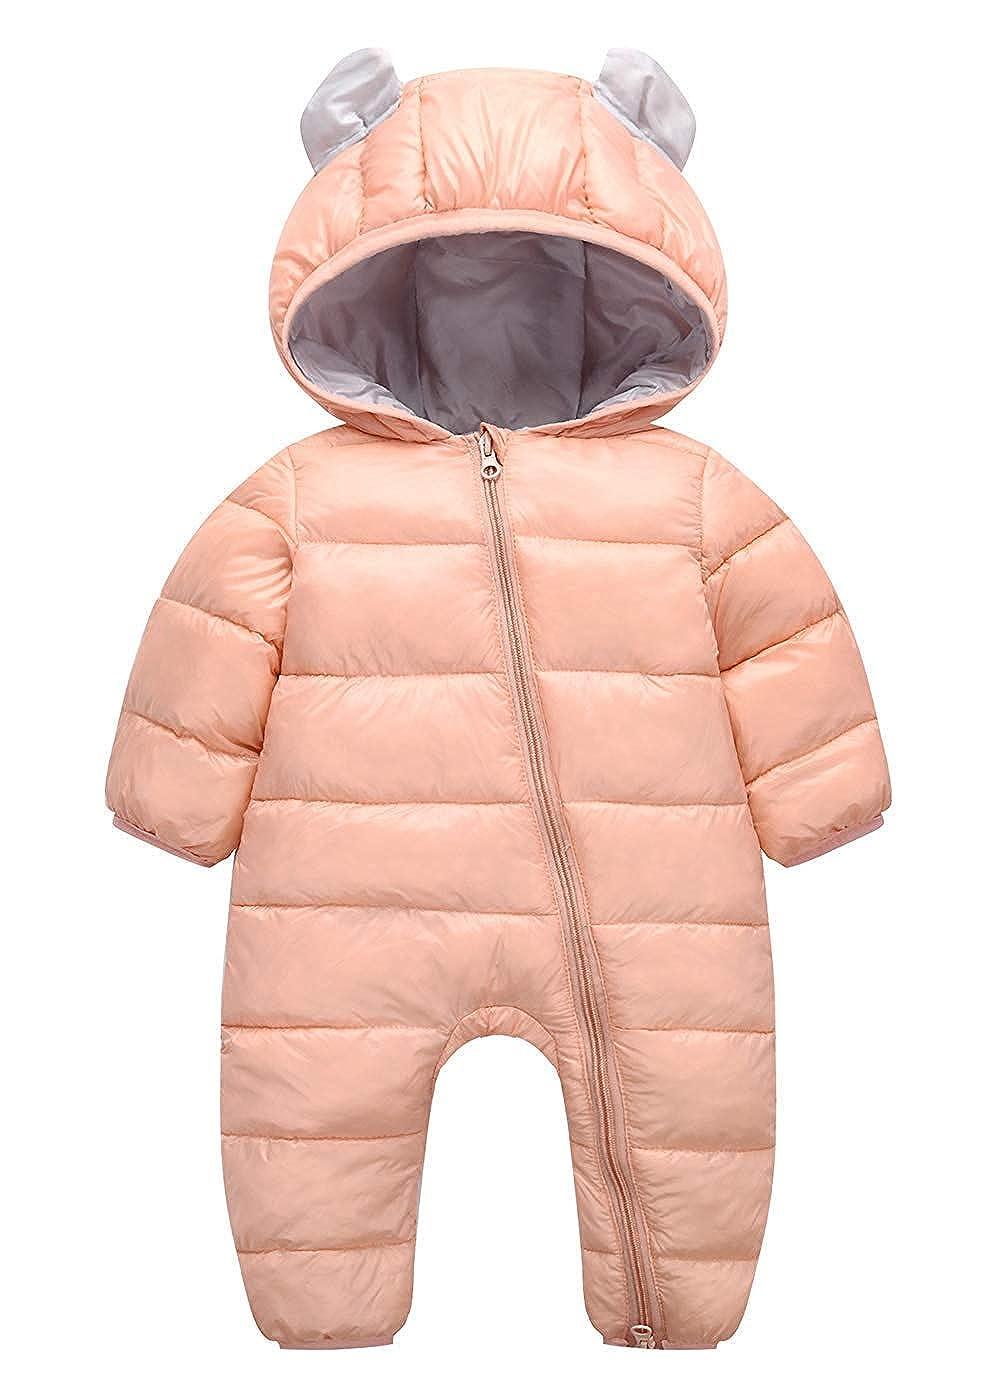 Merryway 3-24 Months Baby Adorable Hoodie Jumpsuit Snow Suit Winter Zip Up Long Sleeve One-Piece Coat MW057